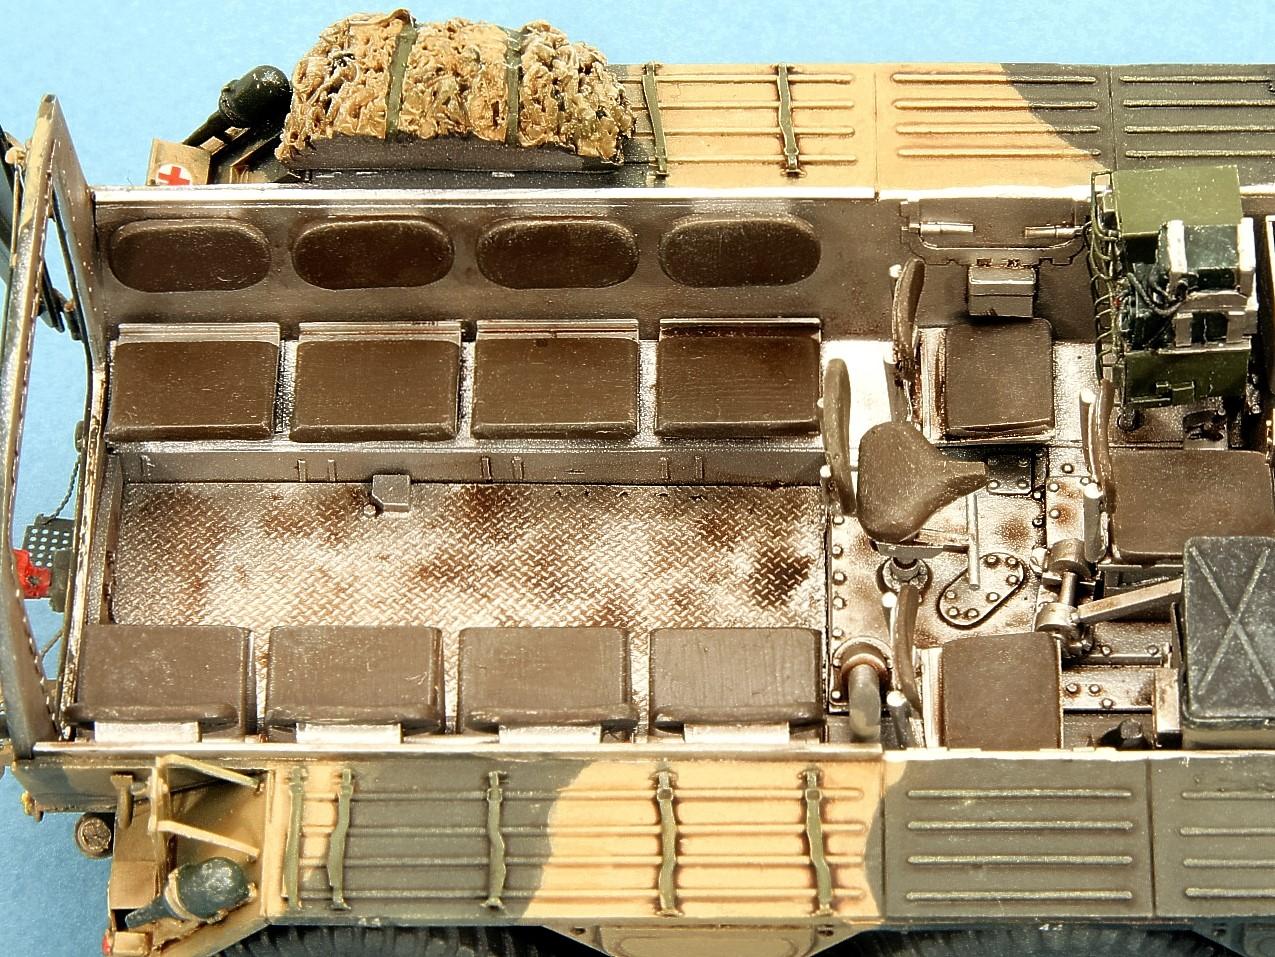 Main image of K191